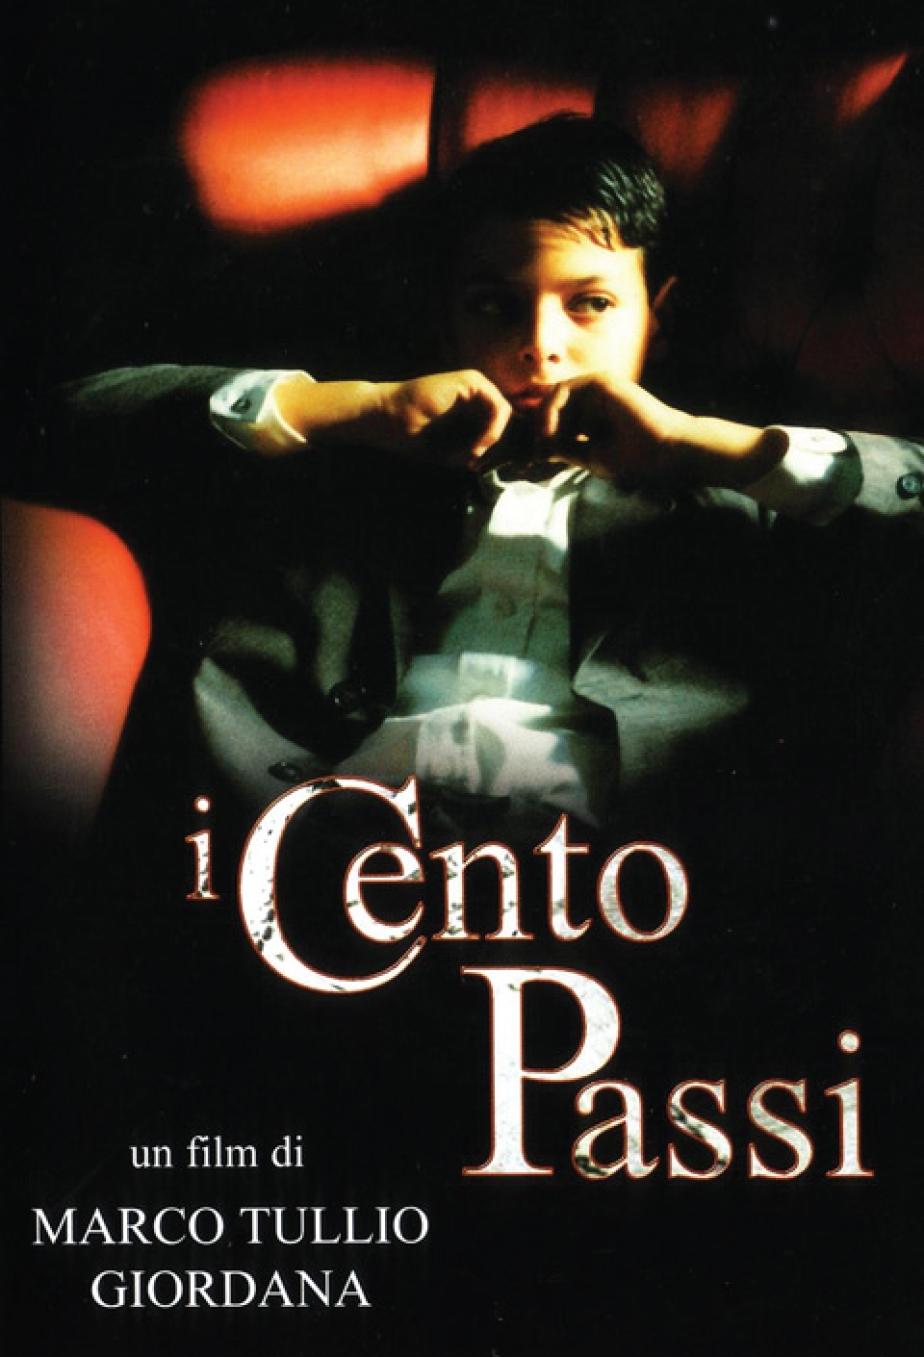 I-cento-passi-cover-locandina